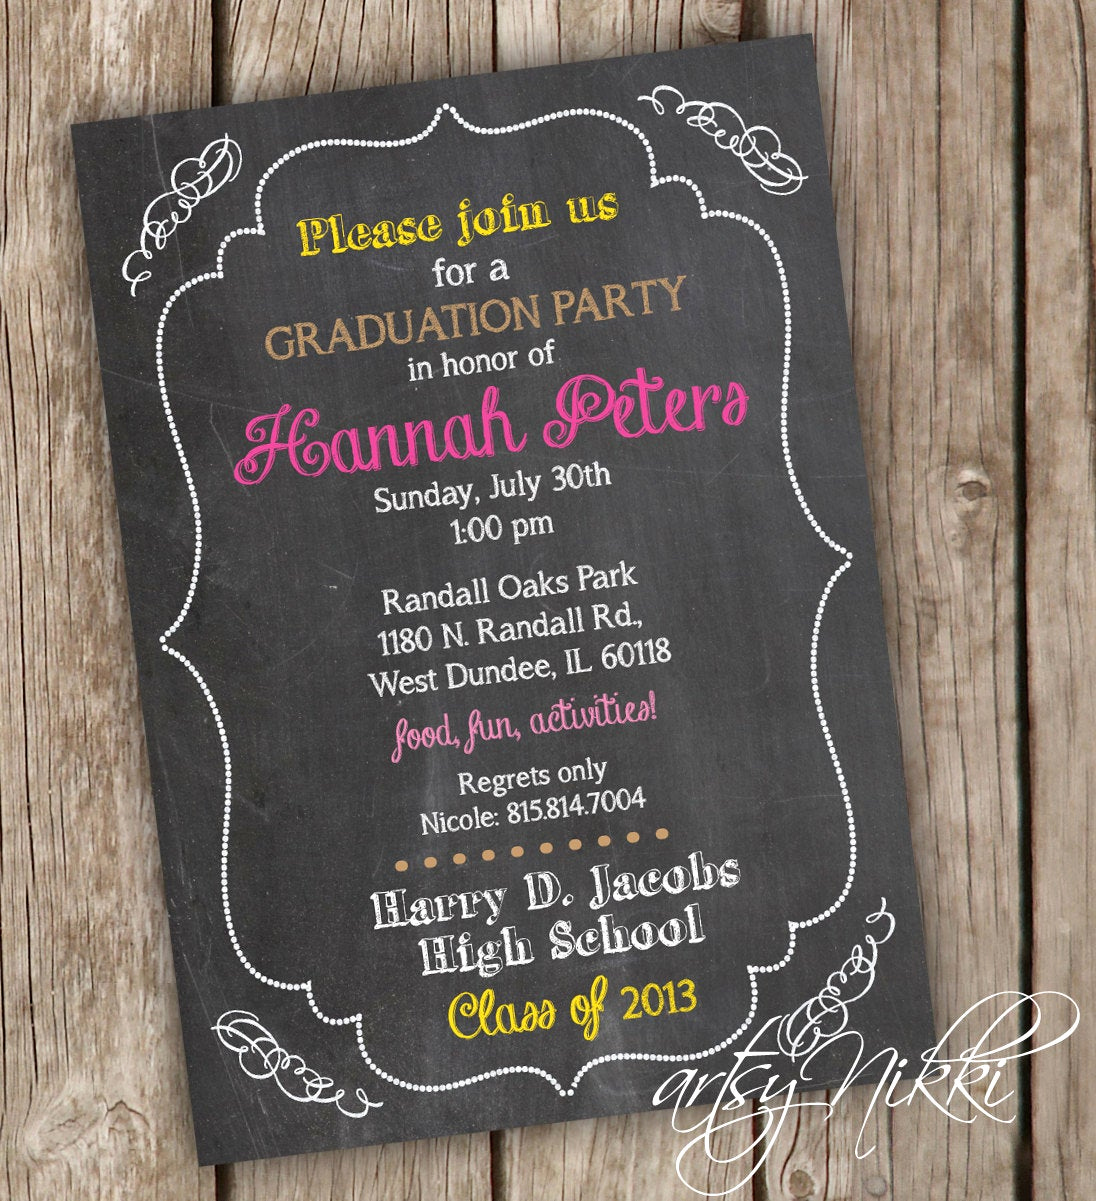 Invitation to Graduation Party Inspirational Graduation Party Invitation Chalkboard Style Graduation